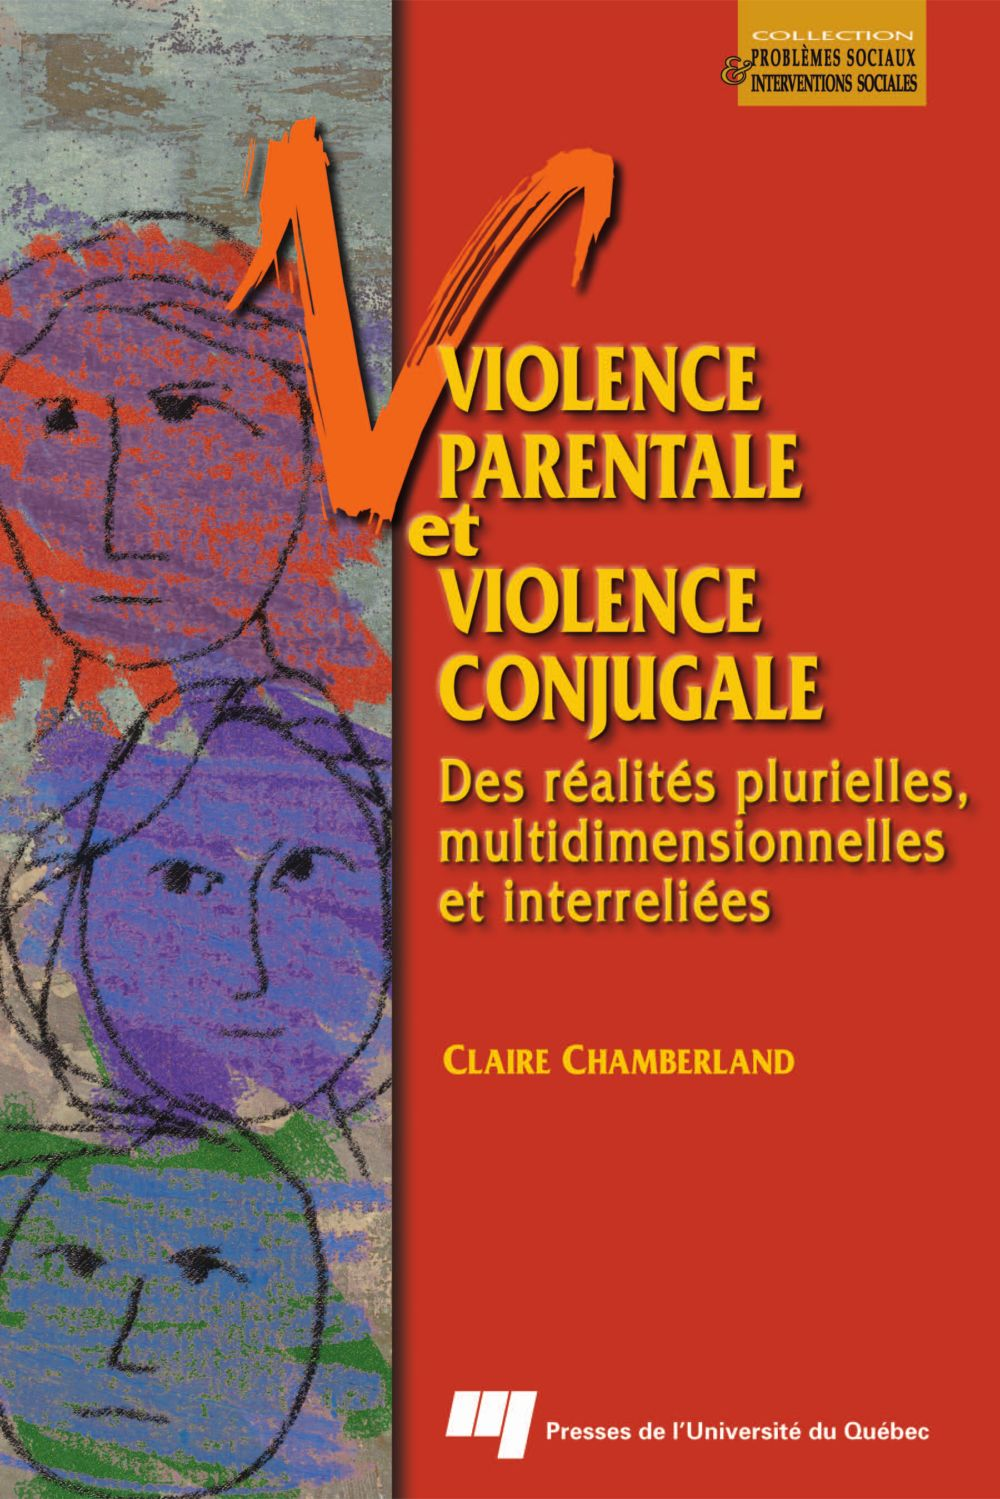 Violence parentale et violence conjugale